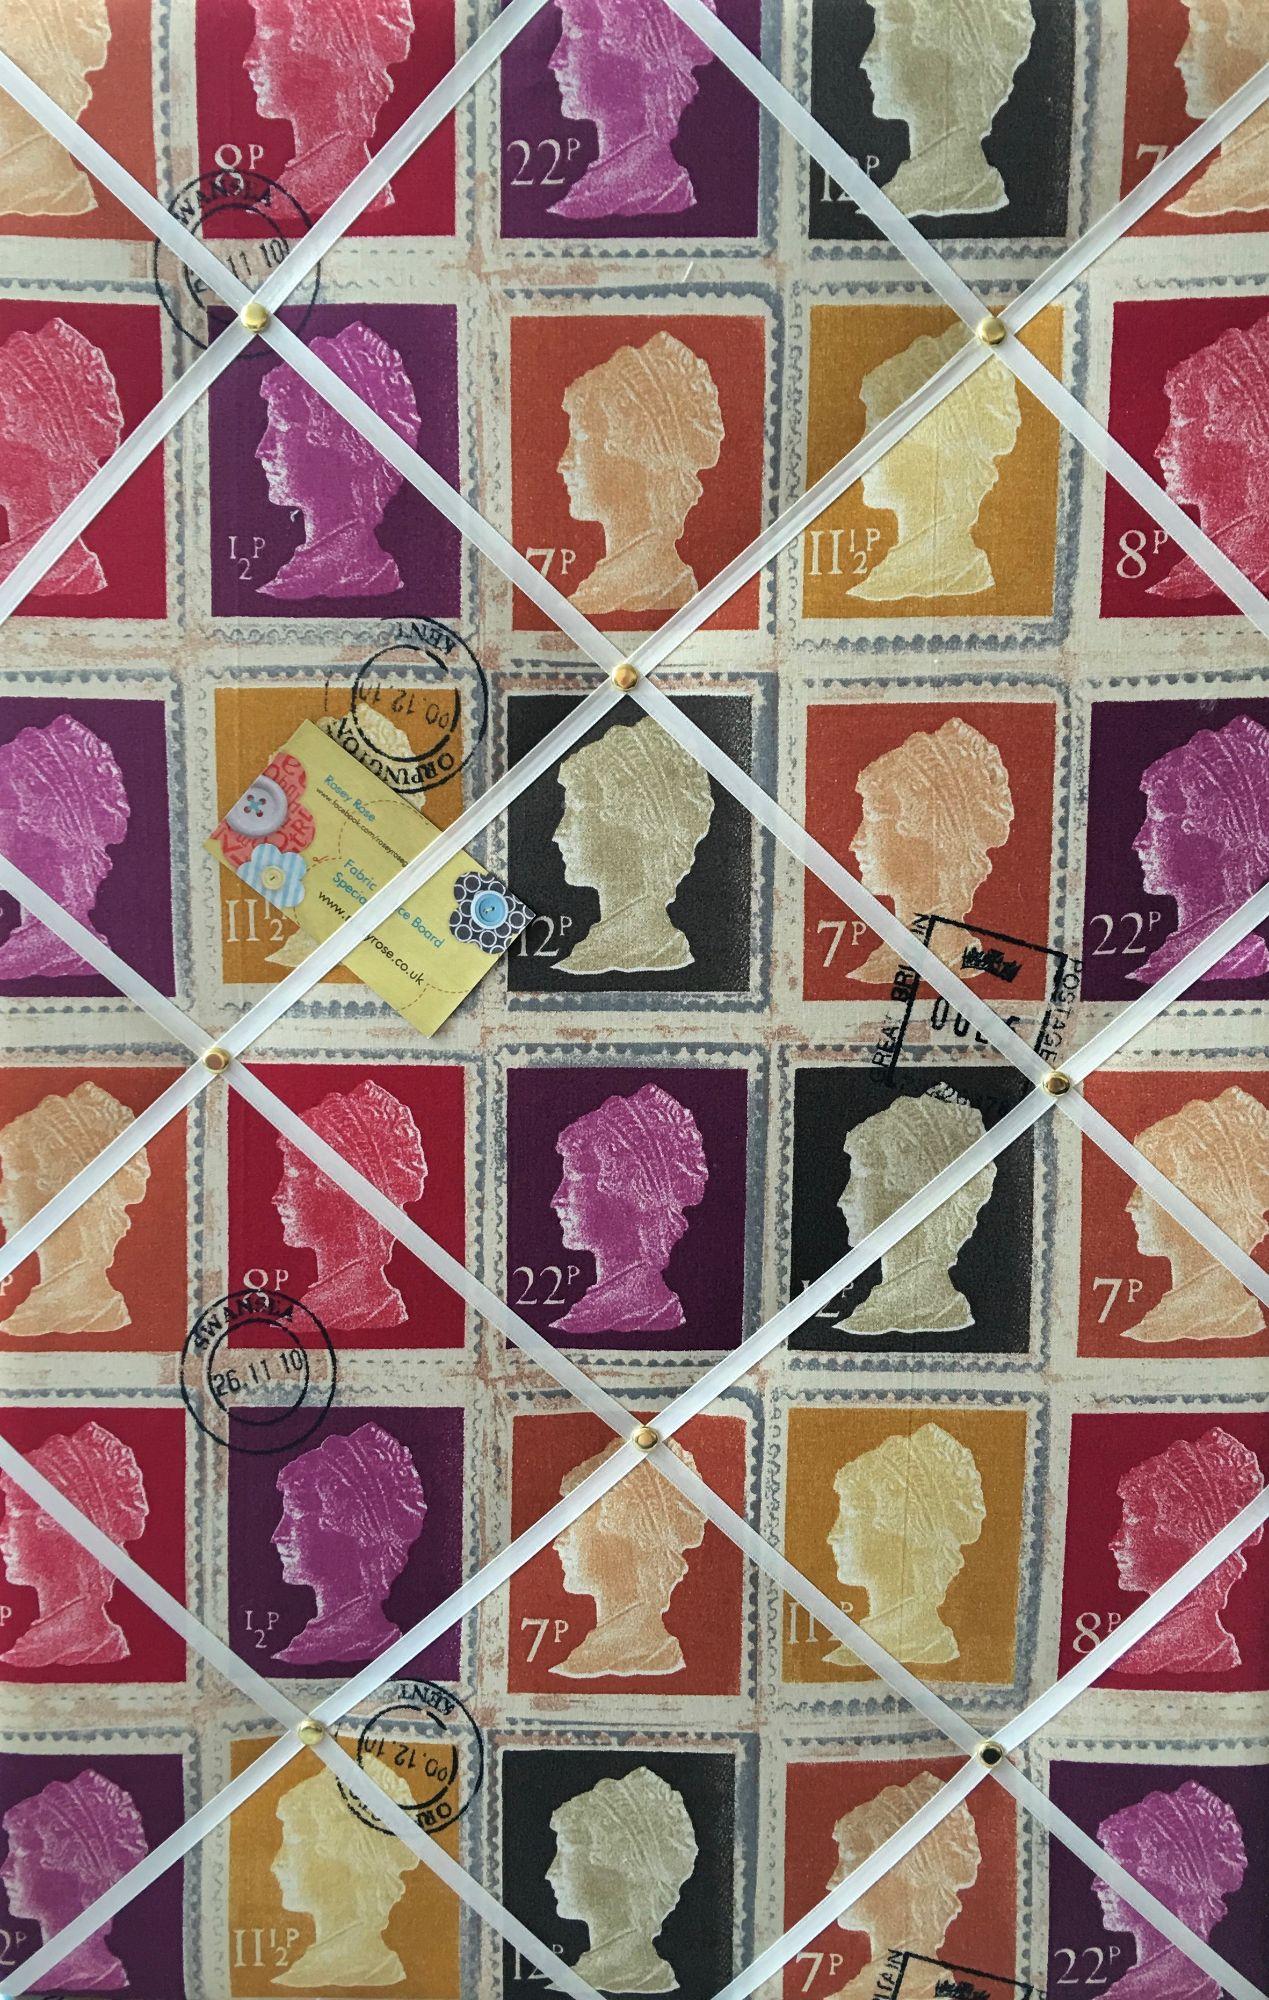 Prestigious Stamp